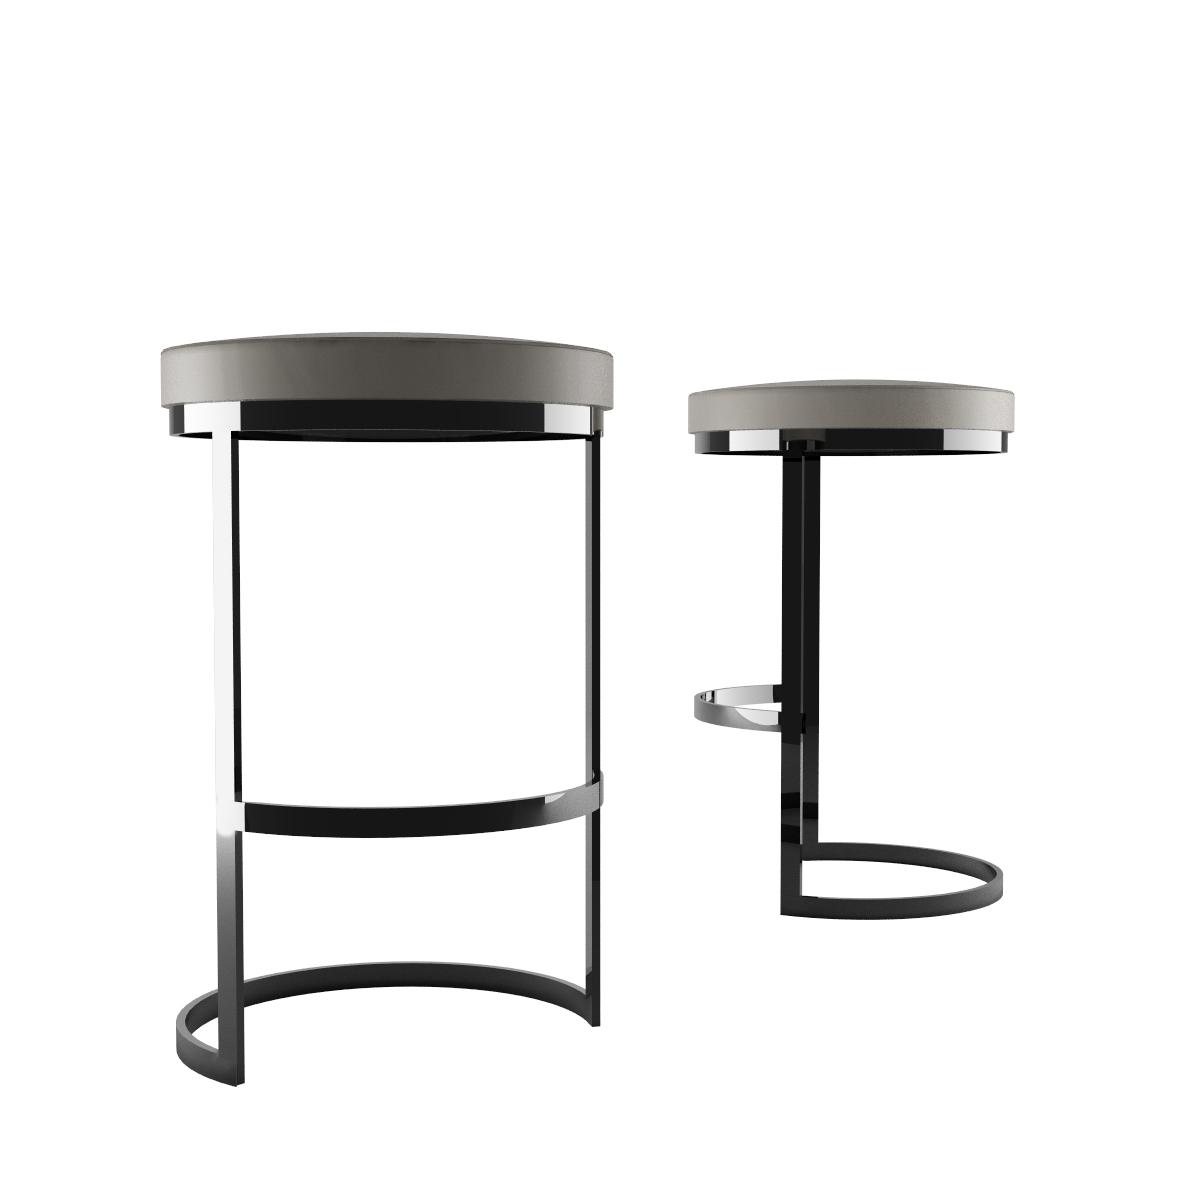 Bar Chairs Zalaba Design AG : olabarchairmodernluxuryblackwhiteleathersteeltif from zalaba.com size 1200 x 1200 jpeg 120kB